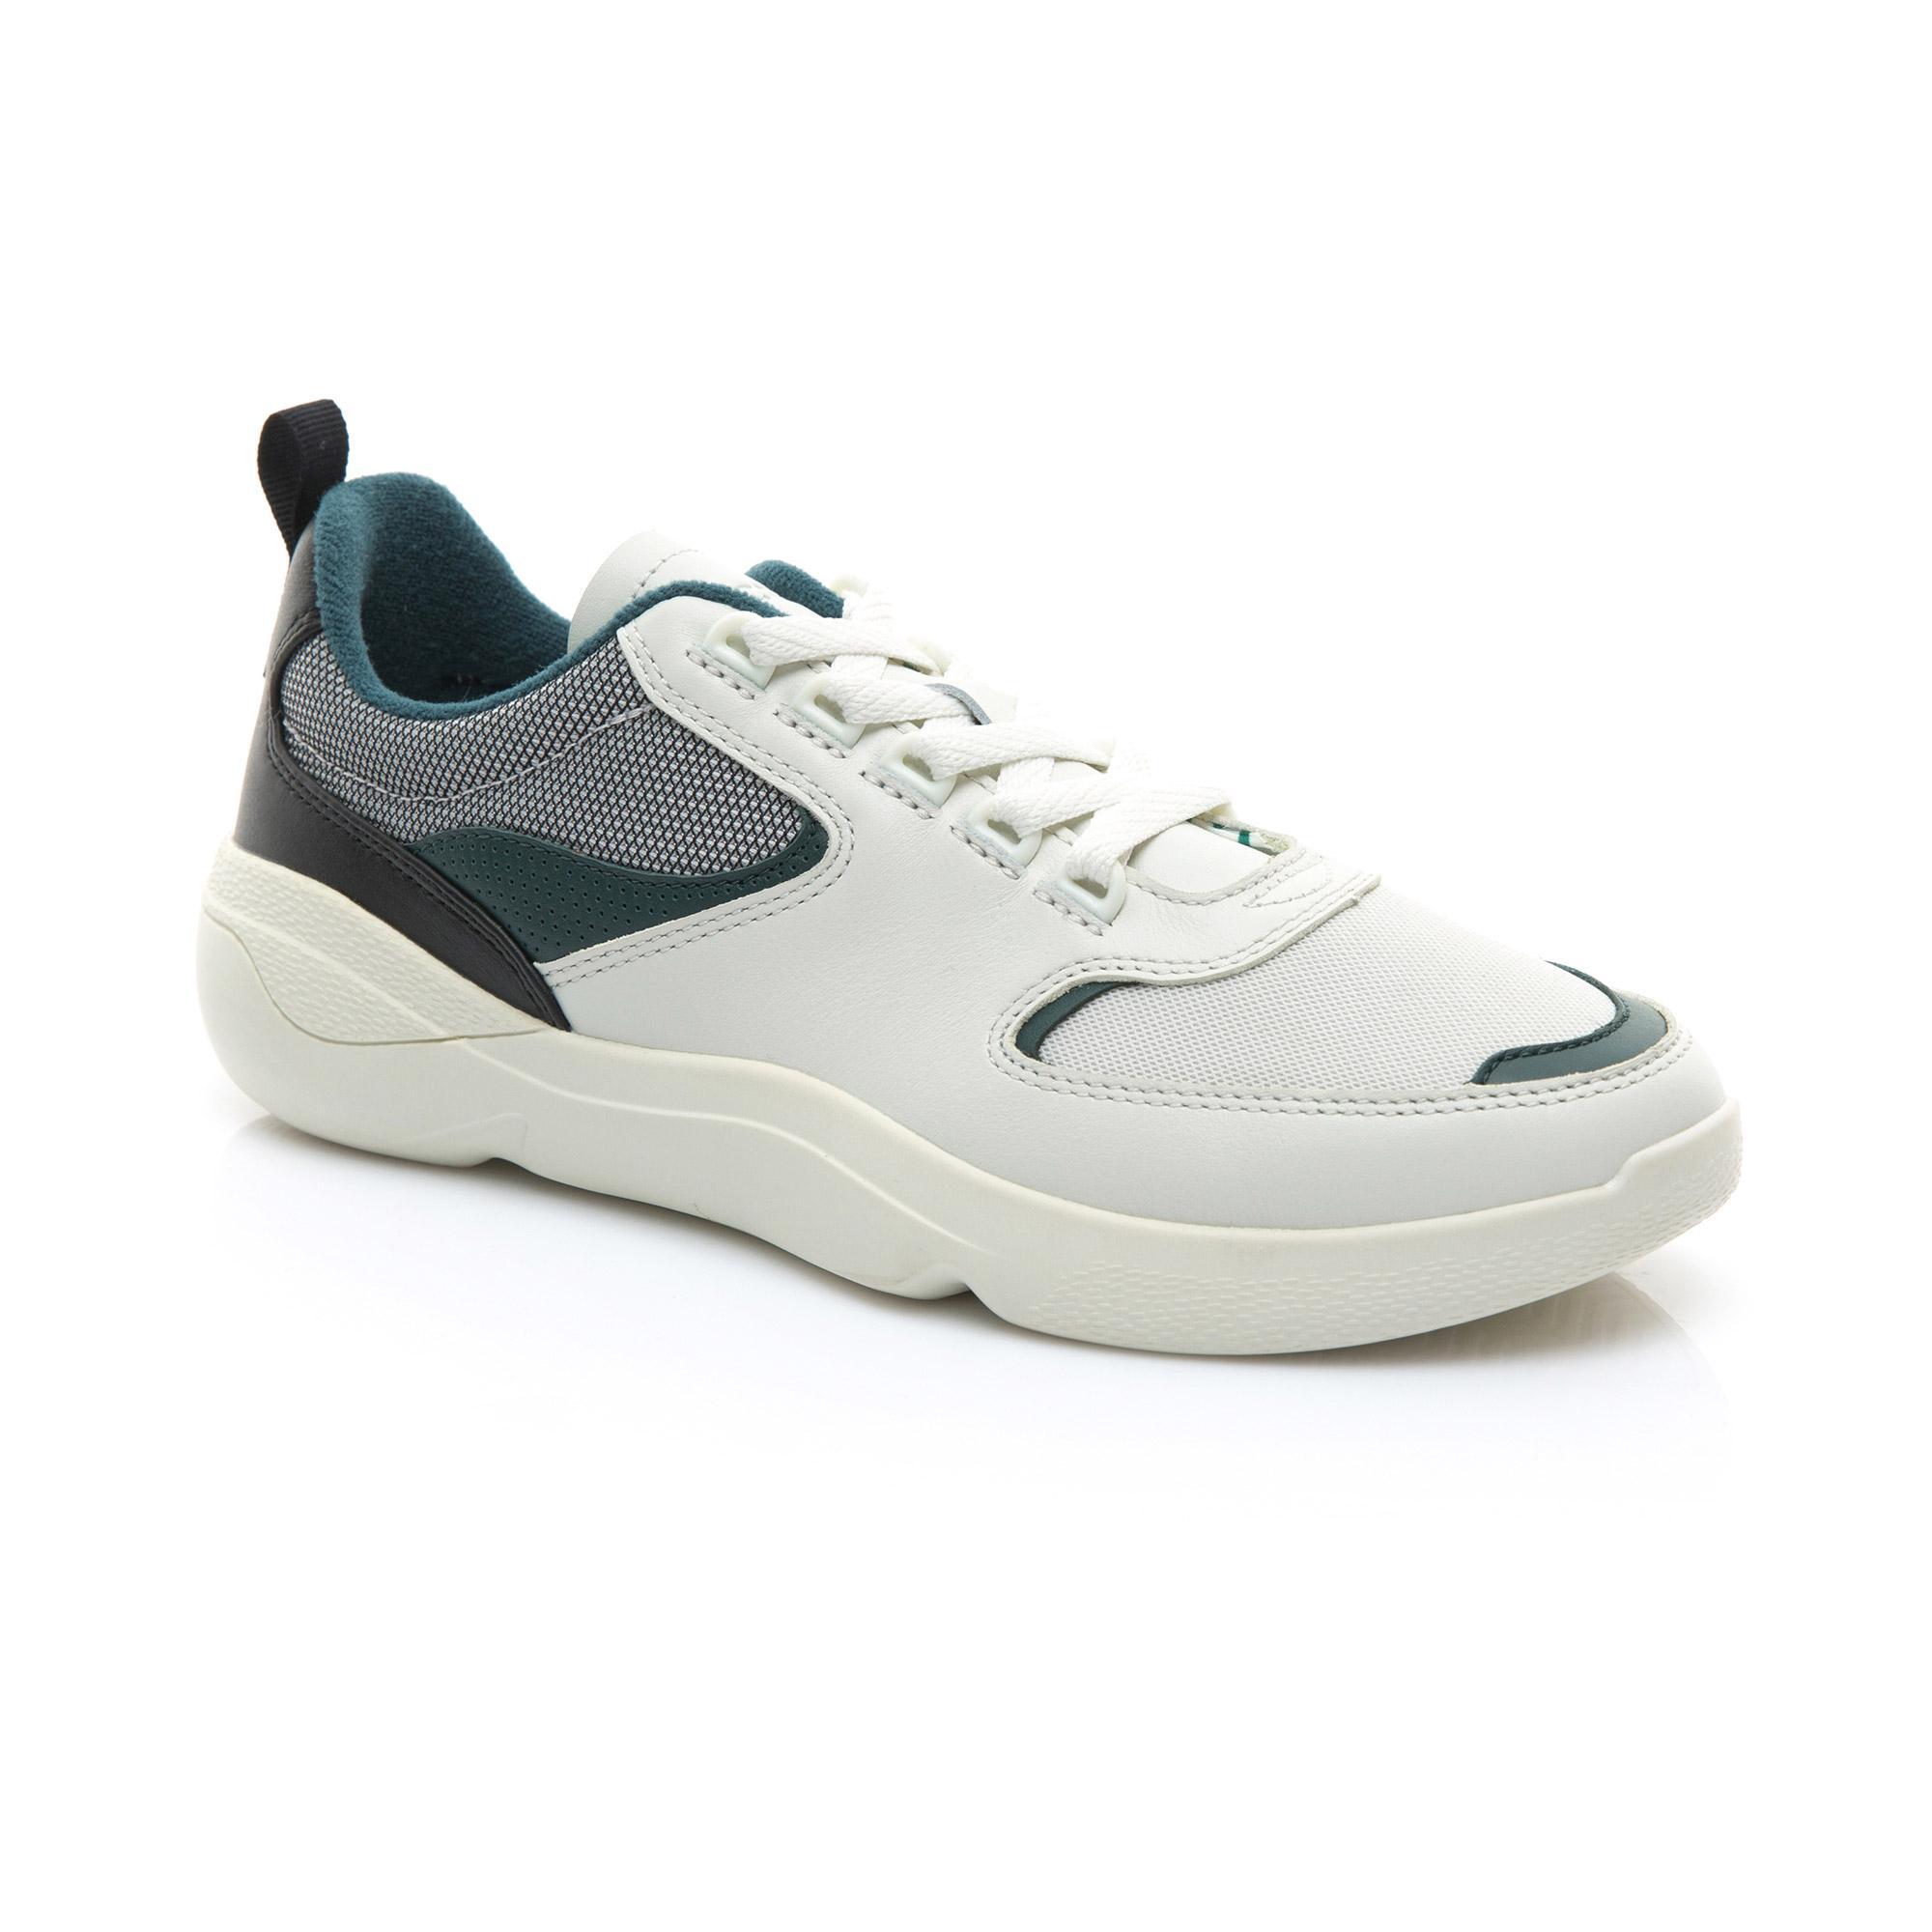 Lacoste Erkek Bej - Koyu Gri Wildcard 119 1 Sneaker